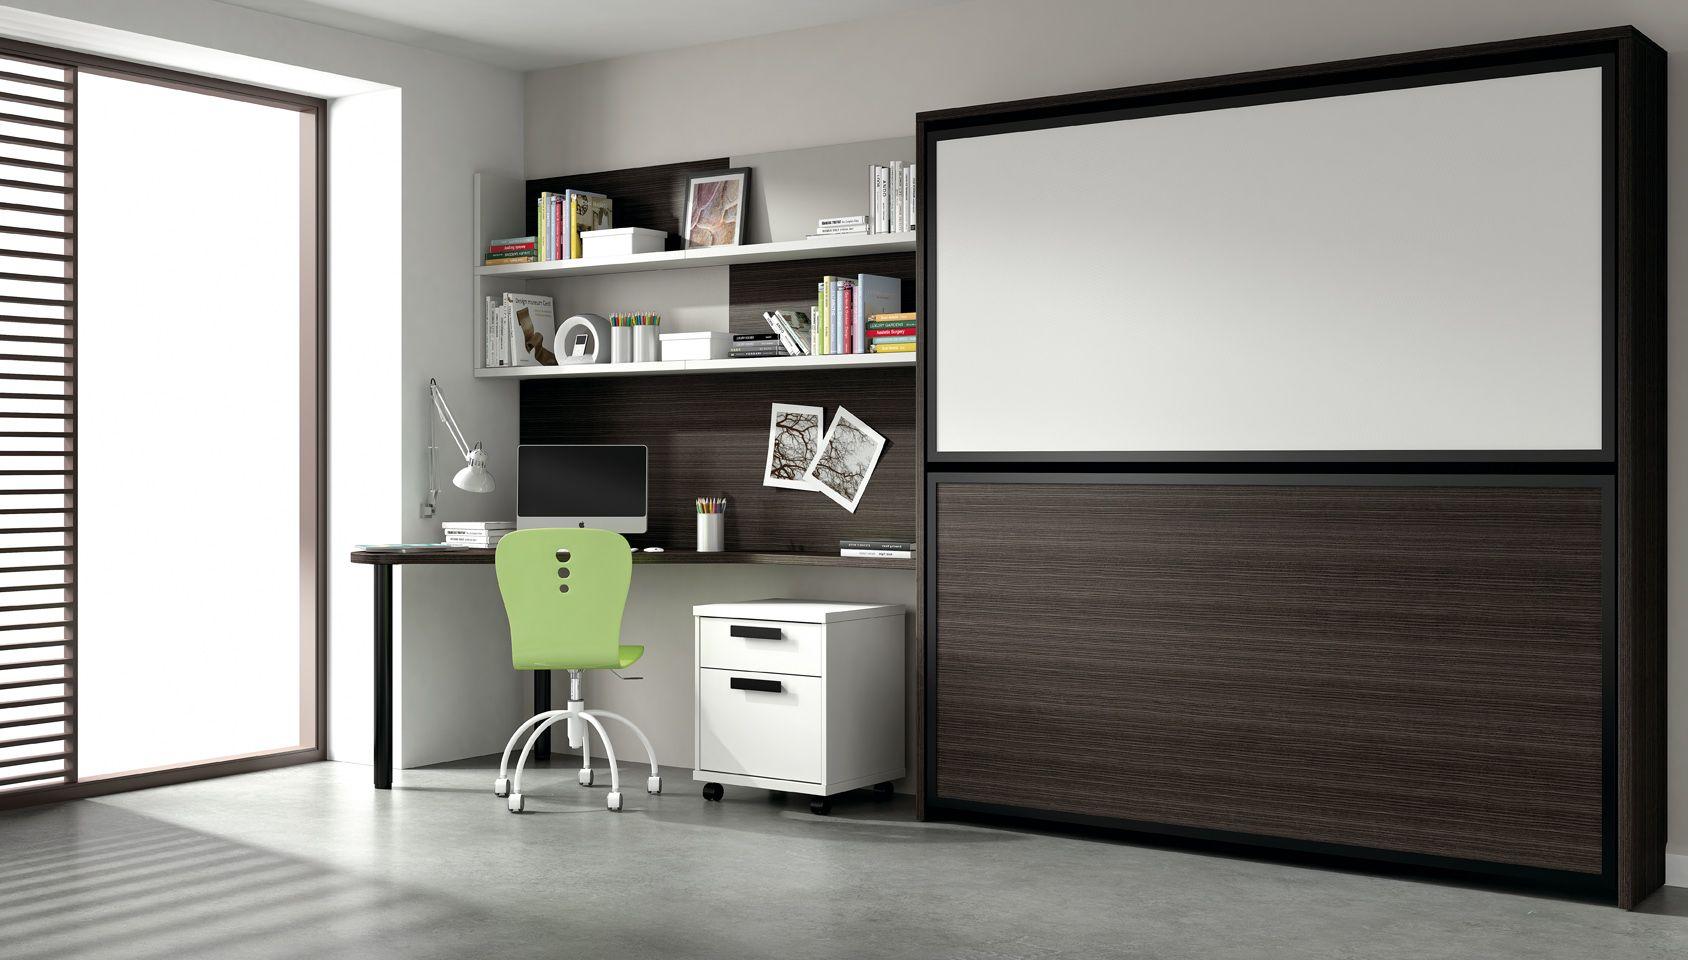 Lits superpos s rabattables 1 personne armoire lit for Lit armoire escamotable rabattable